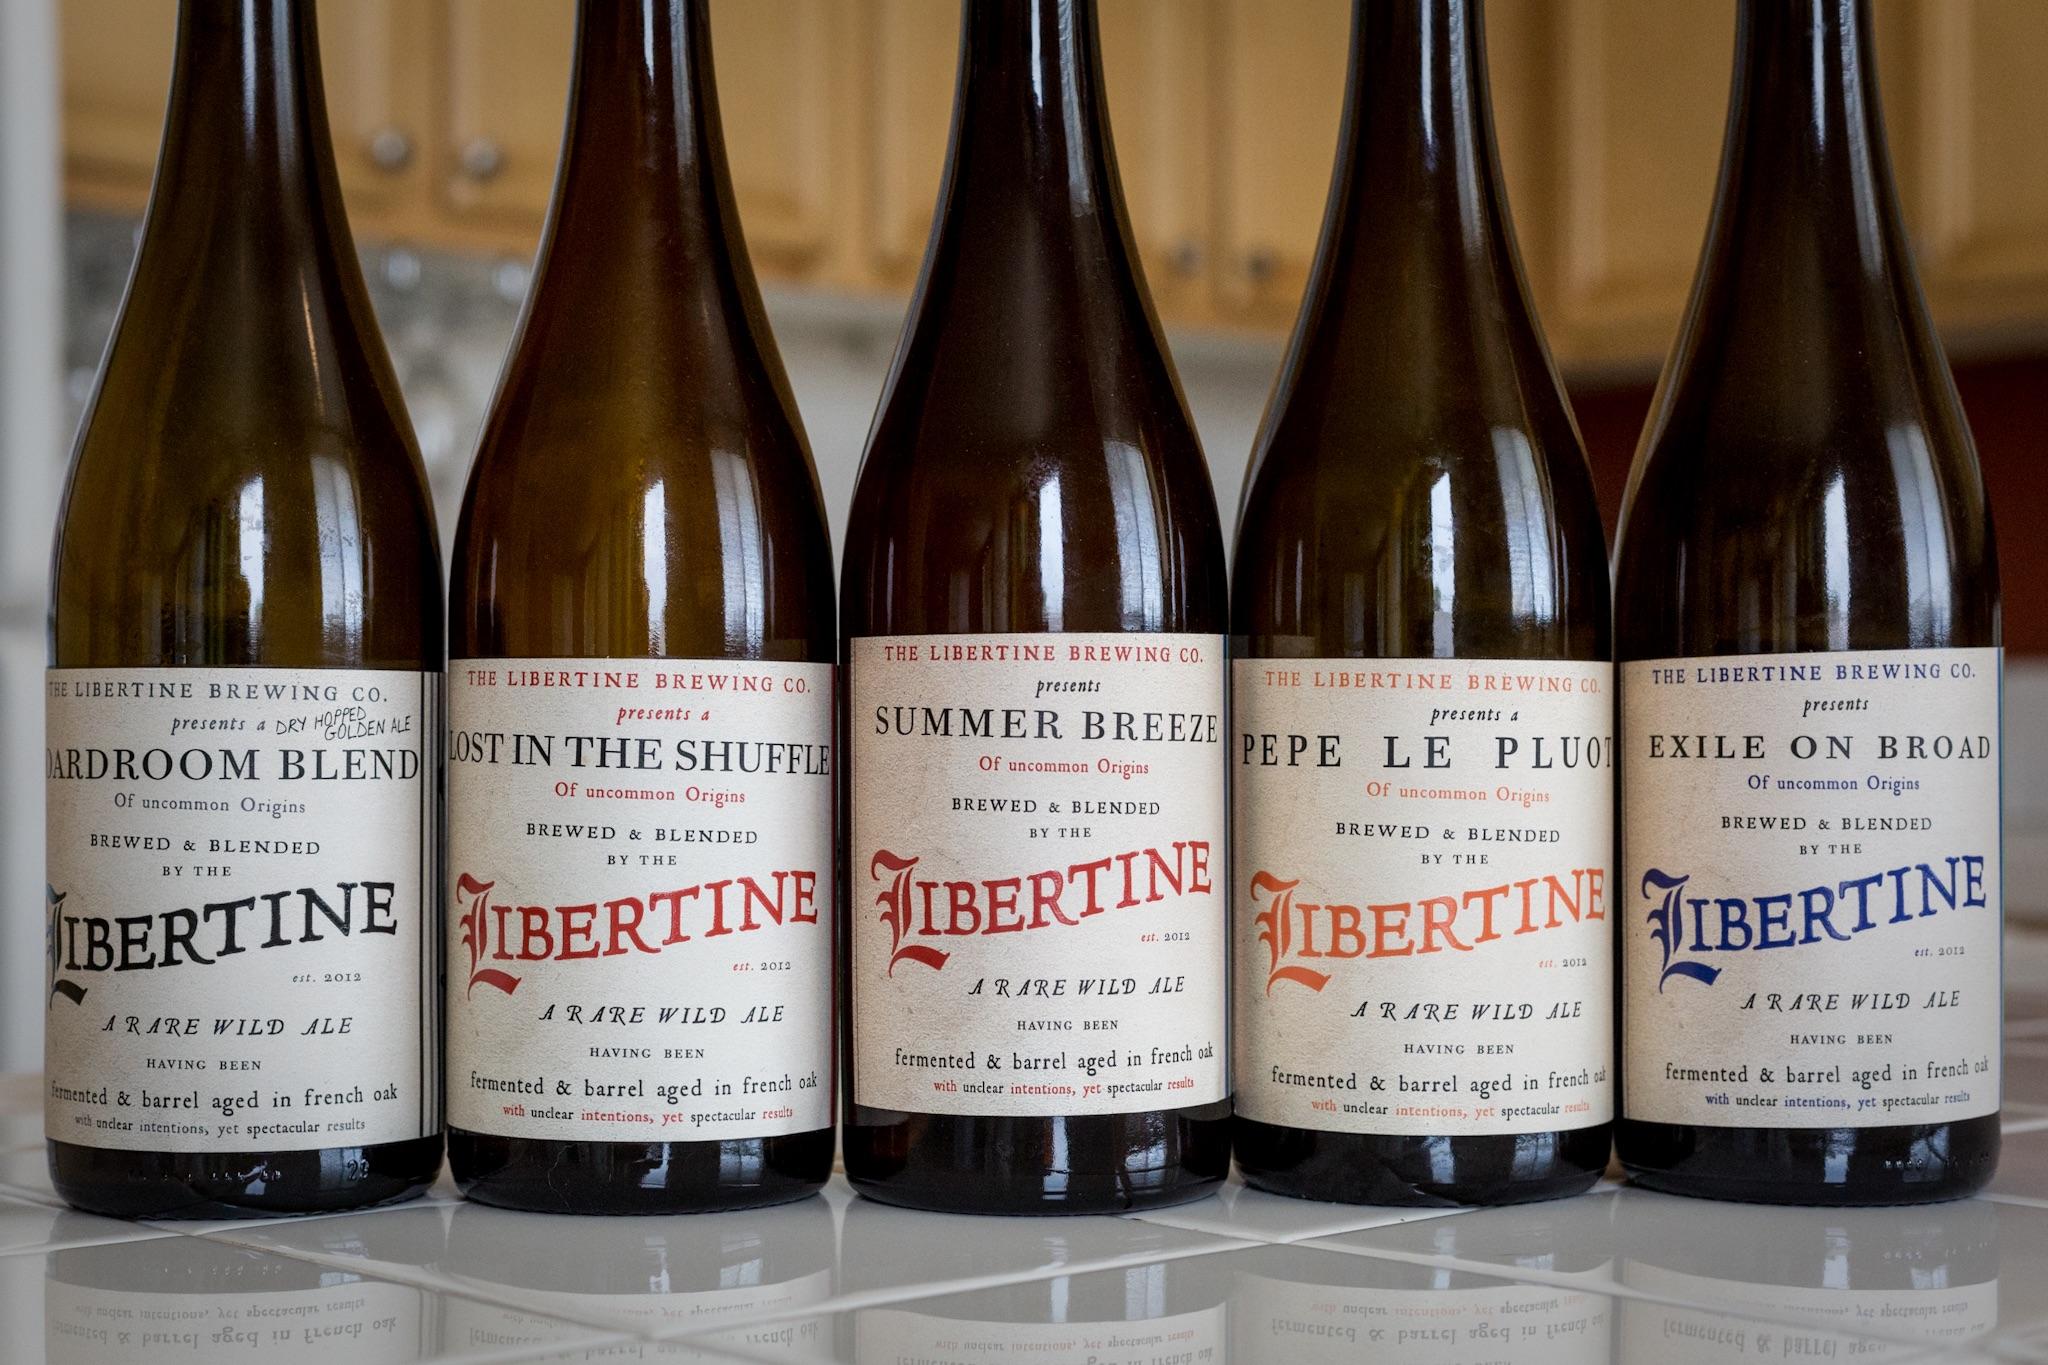 The Libertine Brewing Company